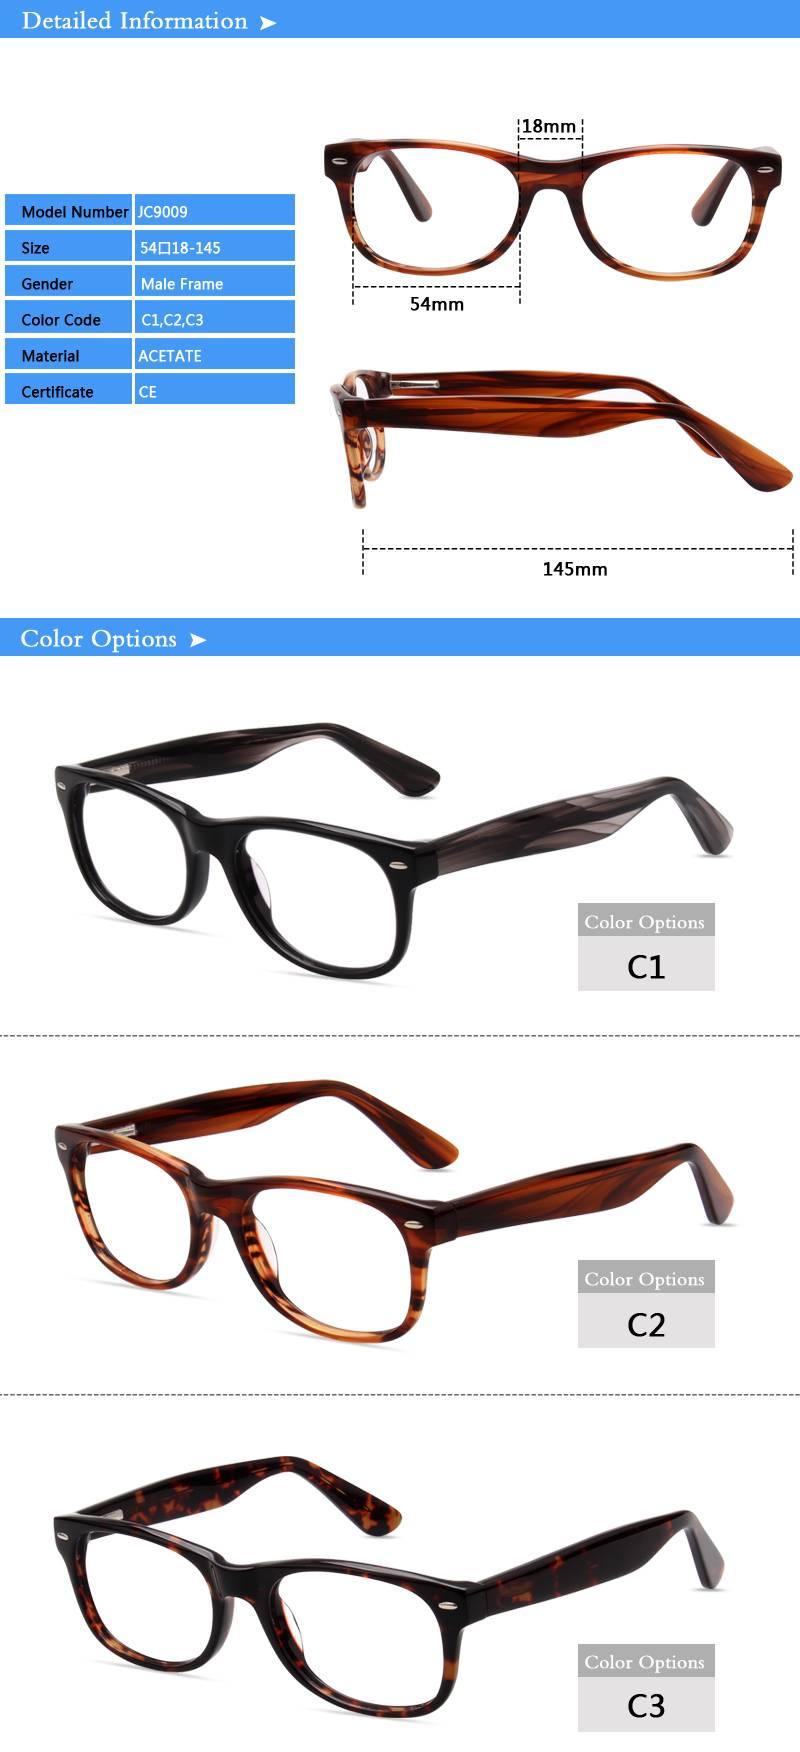 Fashion design acetate eyeglass optical frame JC9009 ready in stock